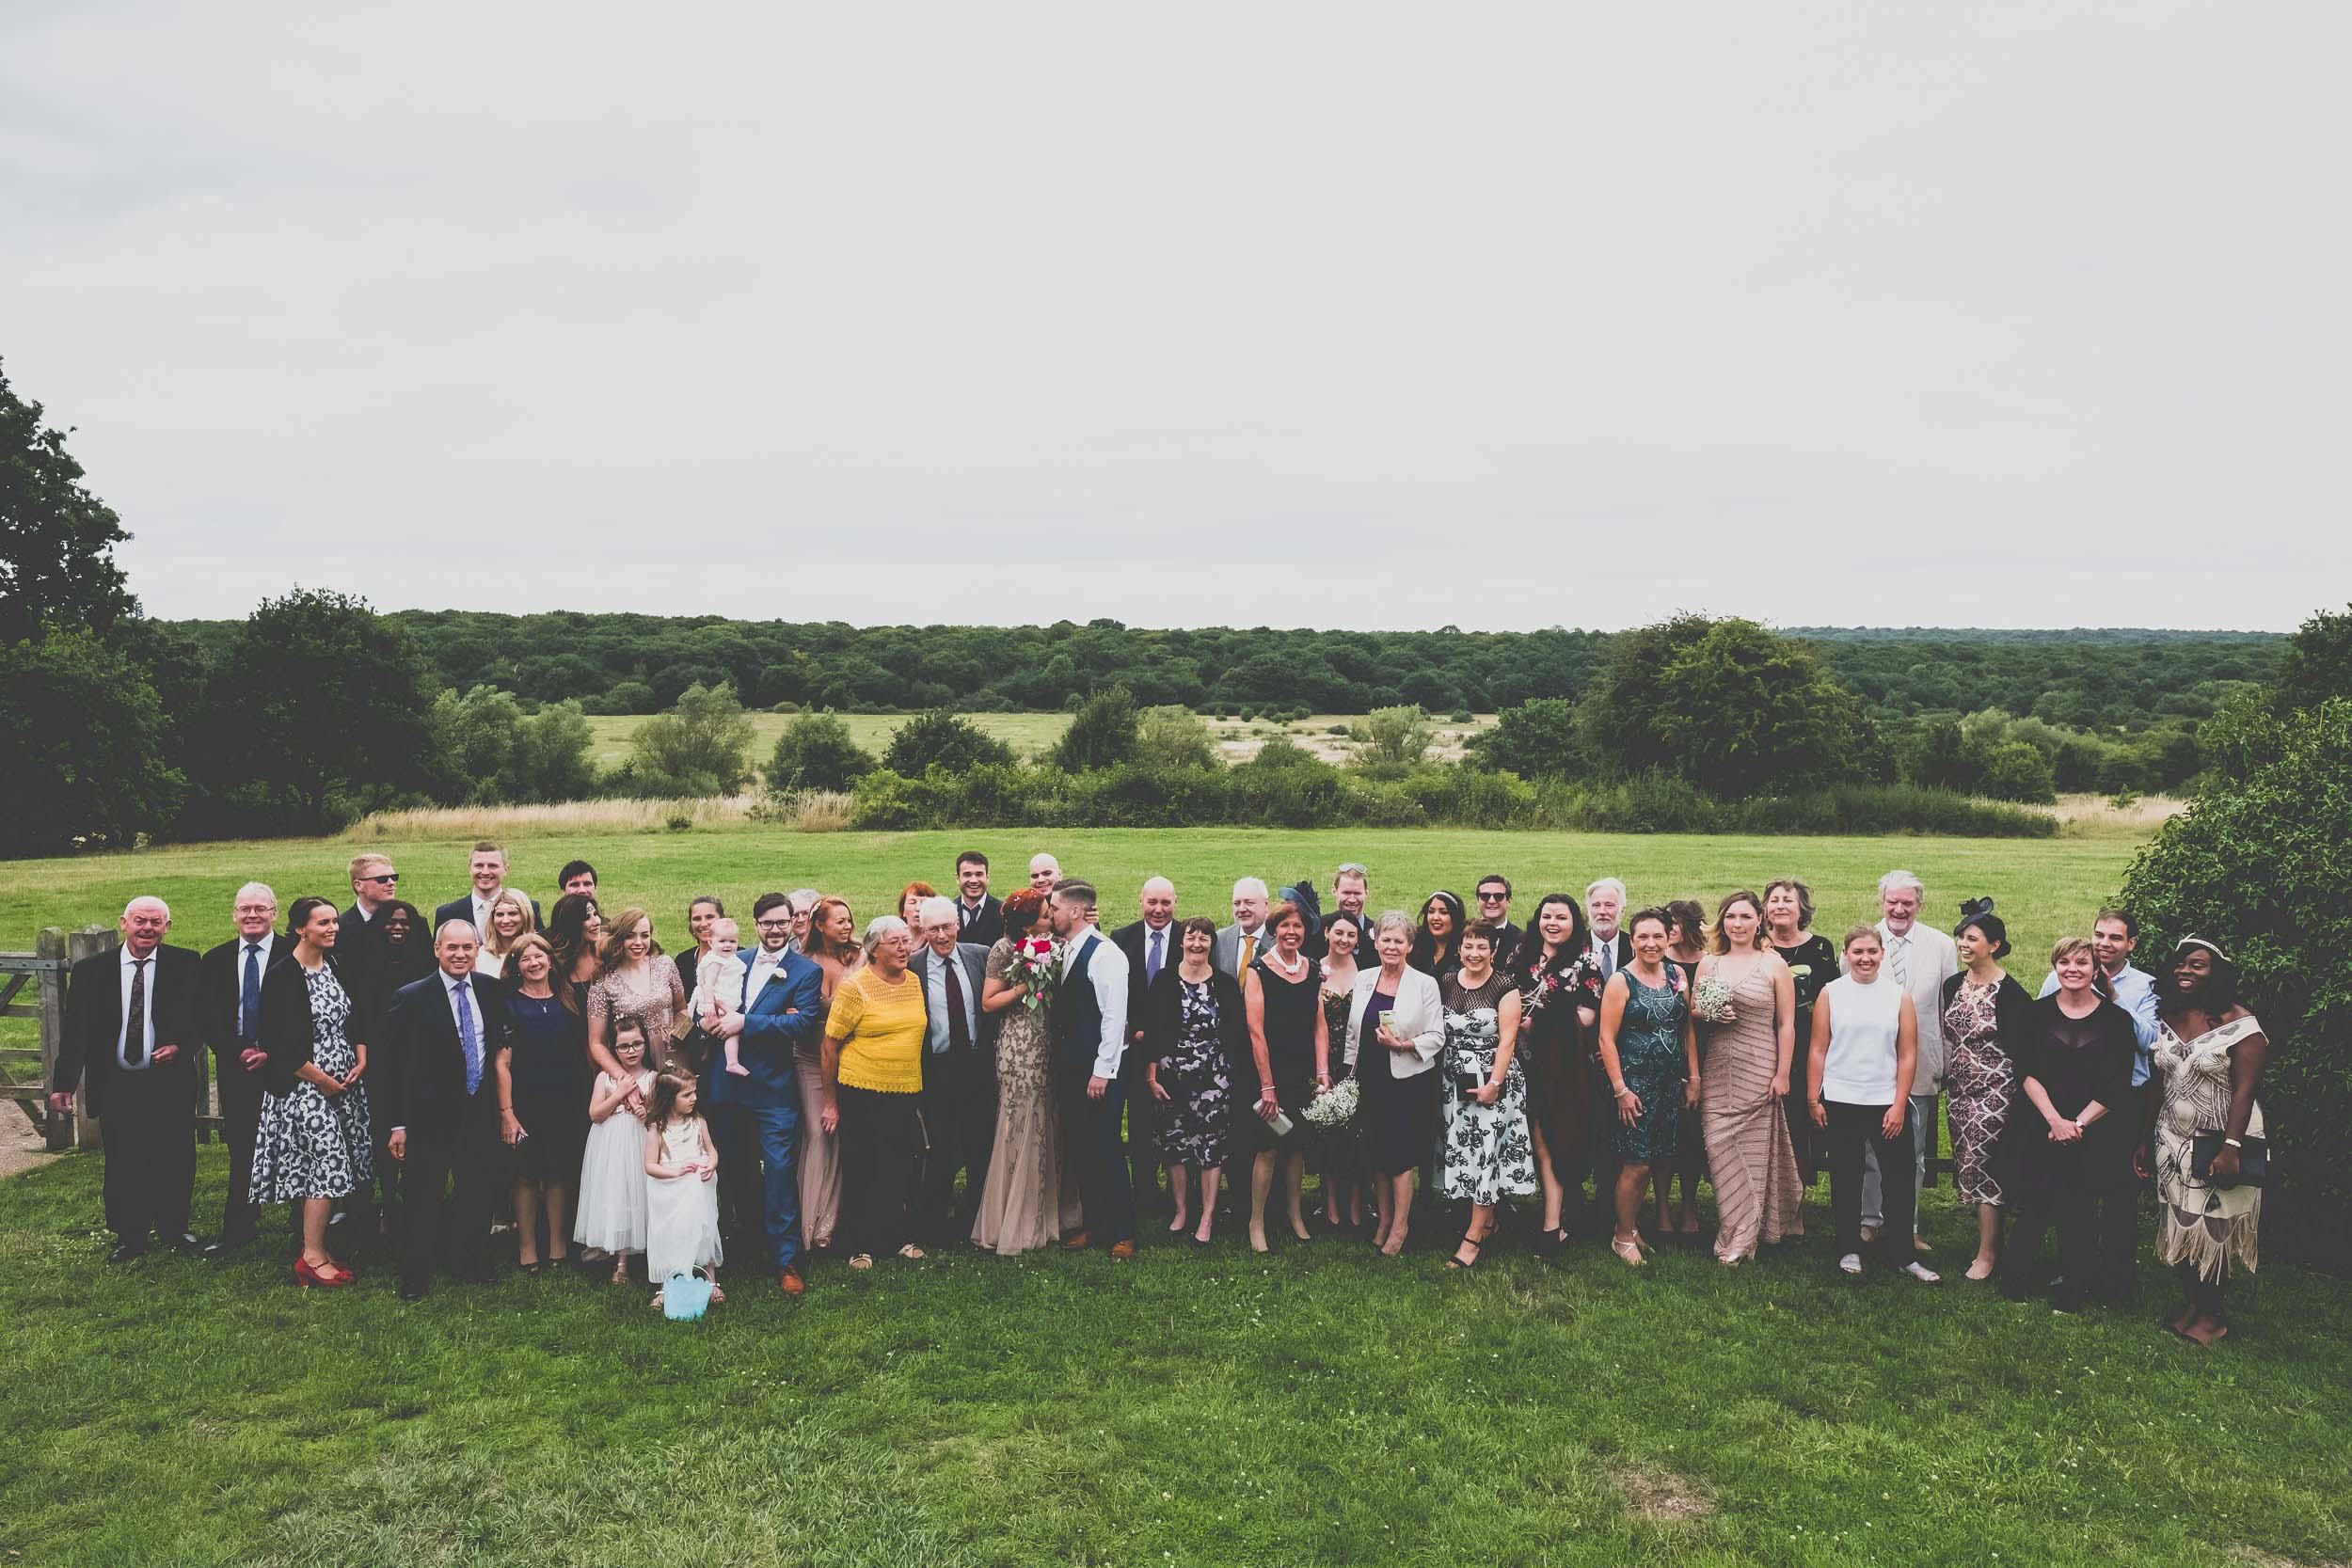 queen-elizabeths-hunting-lodge-epping-forest-wedding236.jpg